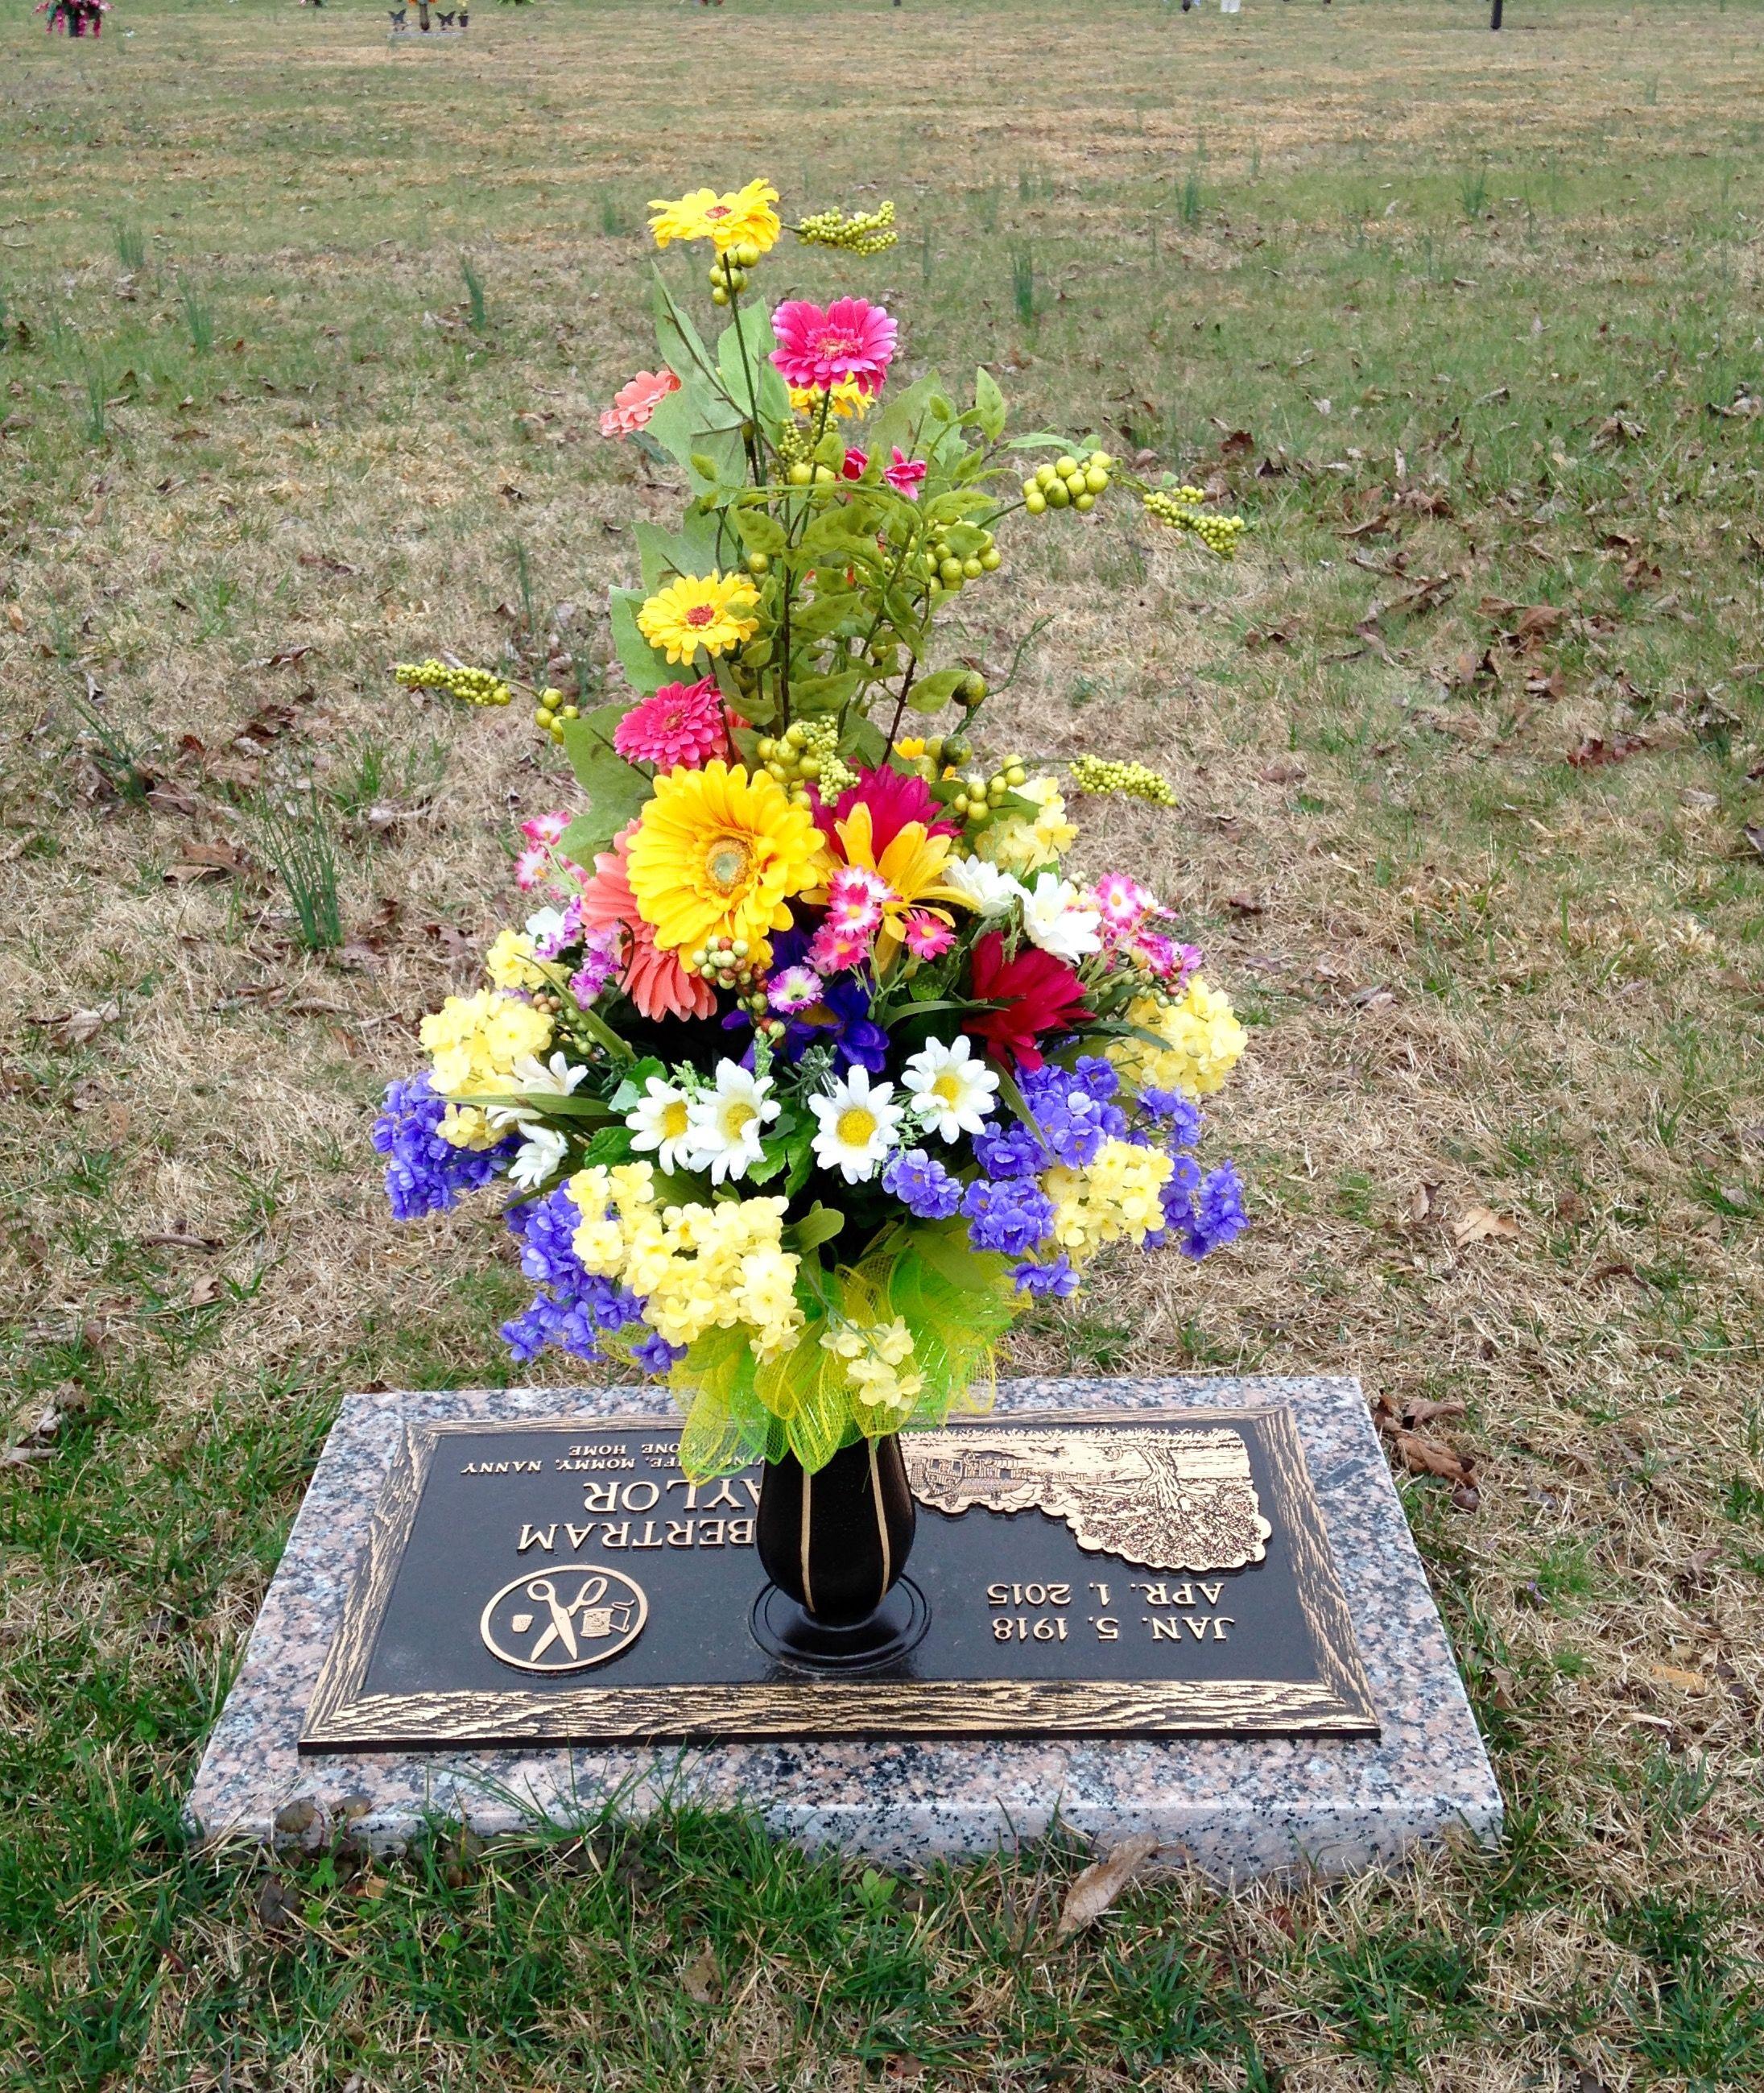 Summer Flowers For Grave Vase Memorial Flowers Artificial Flower Arrangements Flower Vase Arrangements